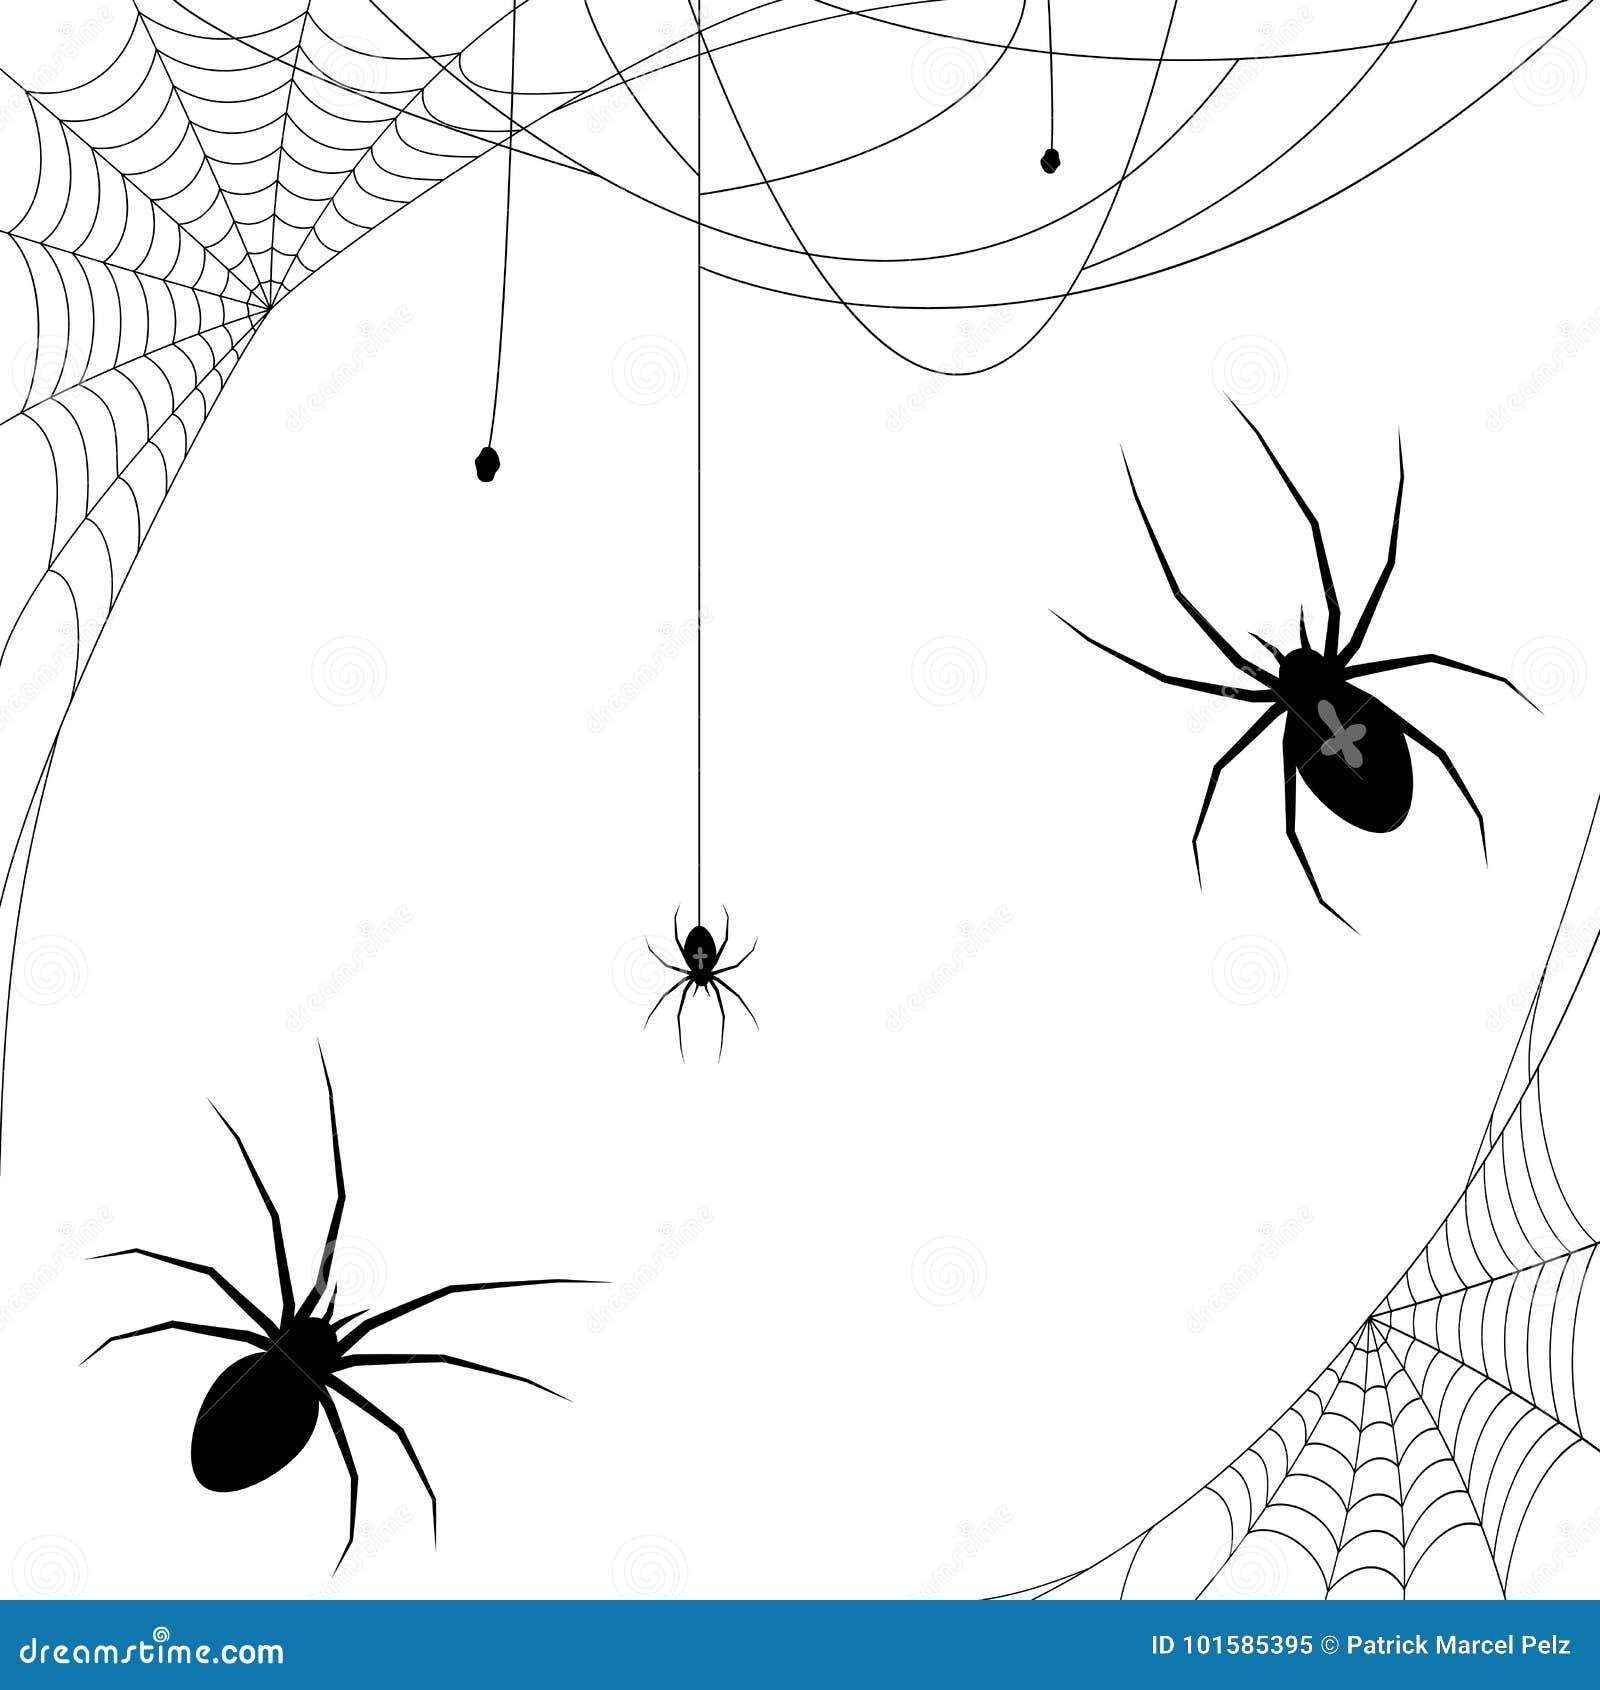 Halloween Spider And Spider Webs Stock Vector - Illustration